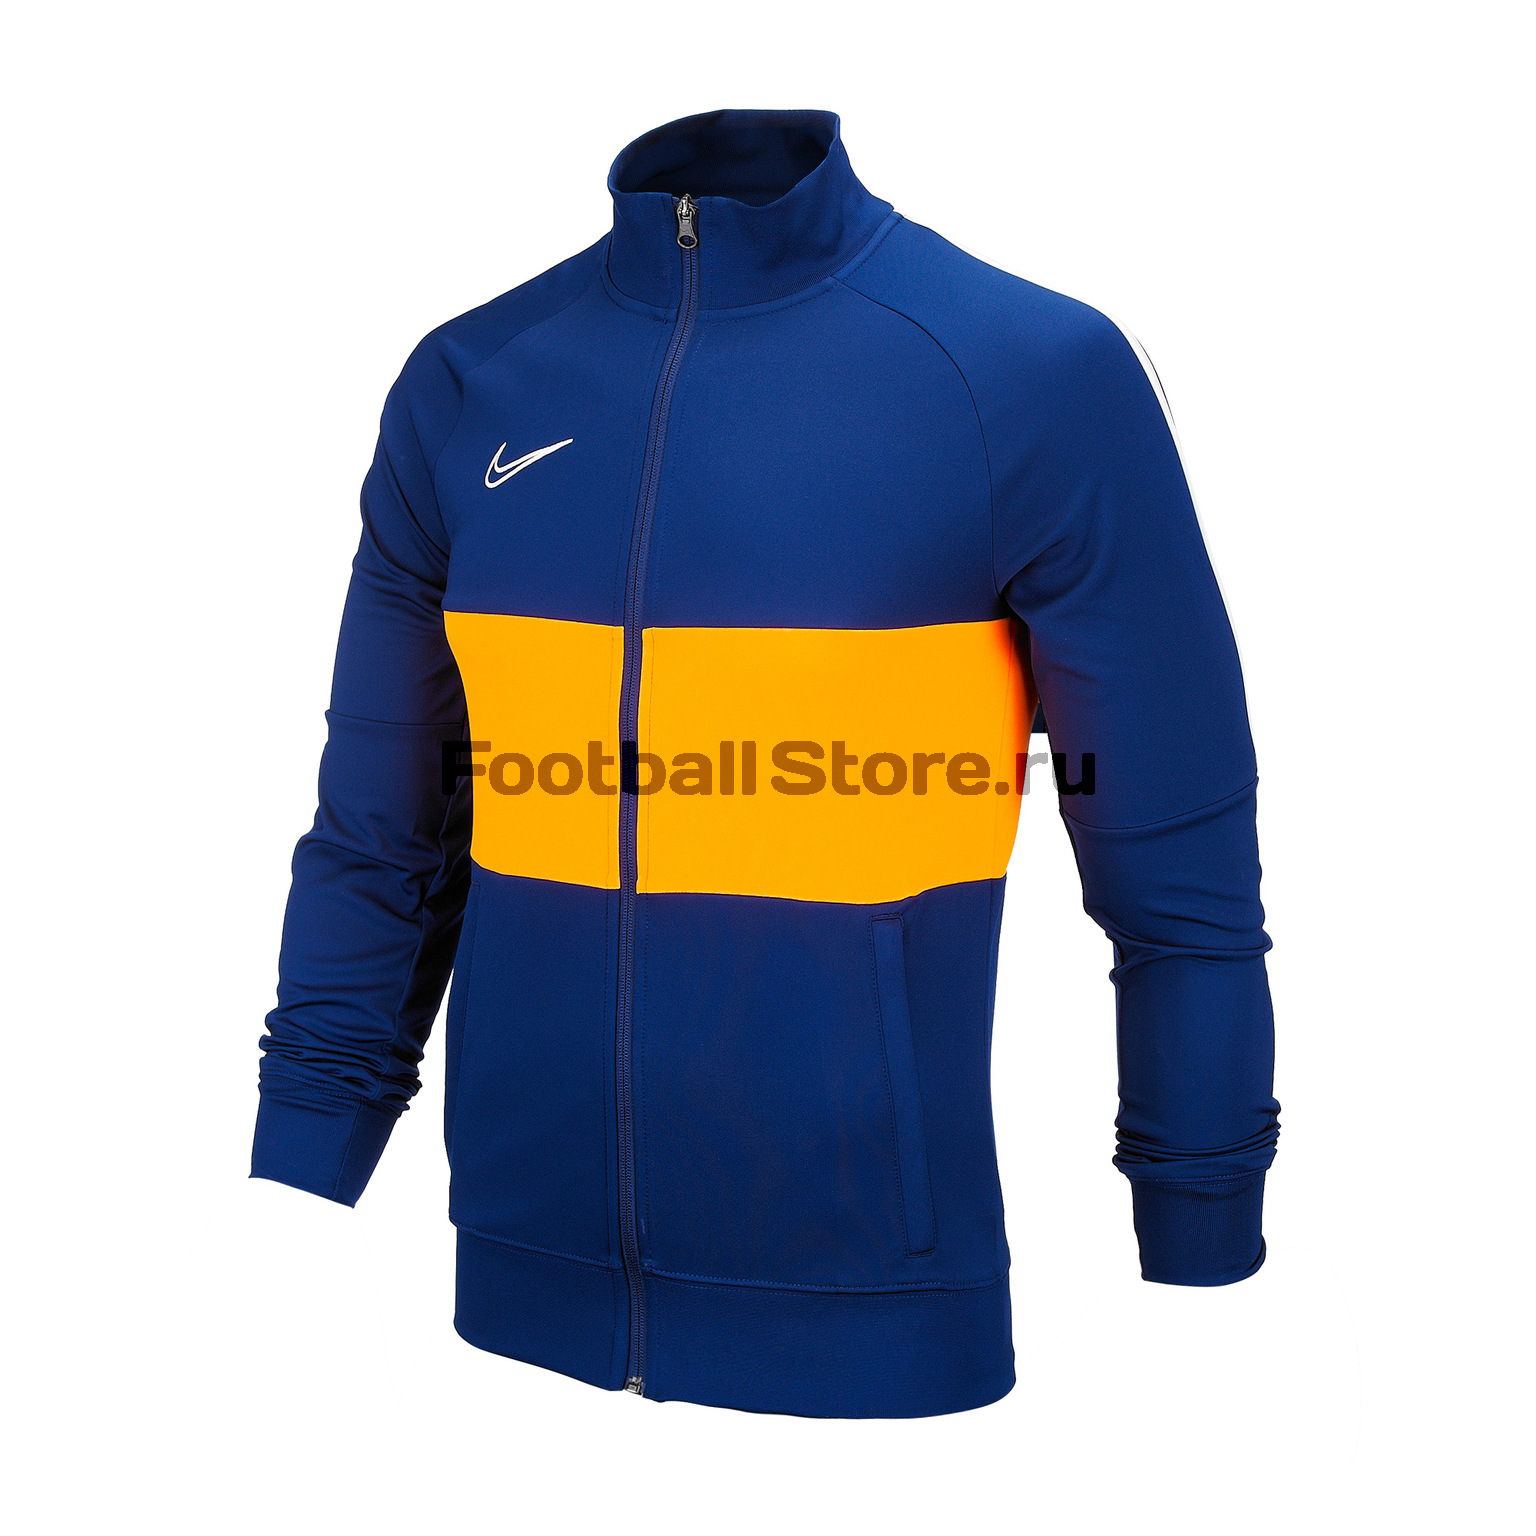 2999d481 Олимпийка Nike Dry Academy TRK AV5414-492 олимпийка nike barcelona dry  strike 858640 011